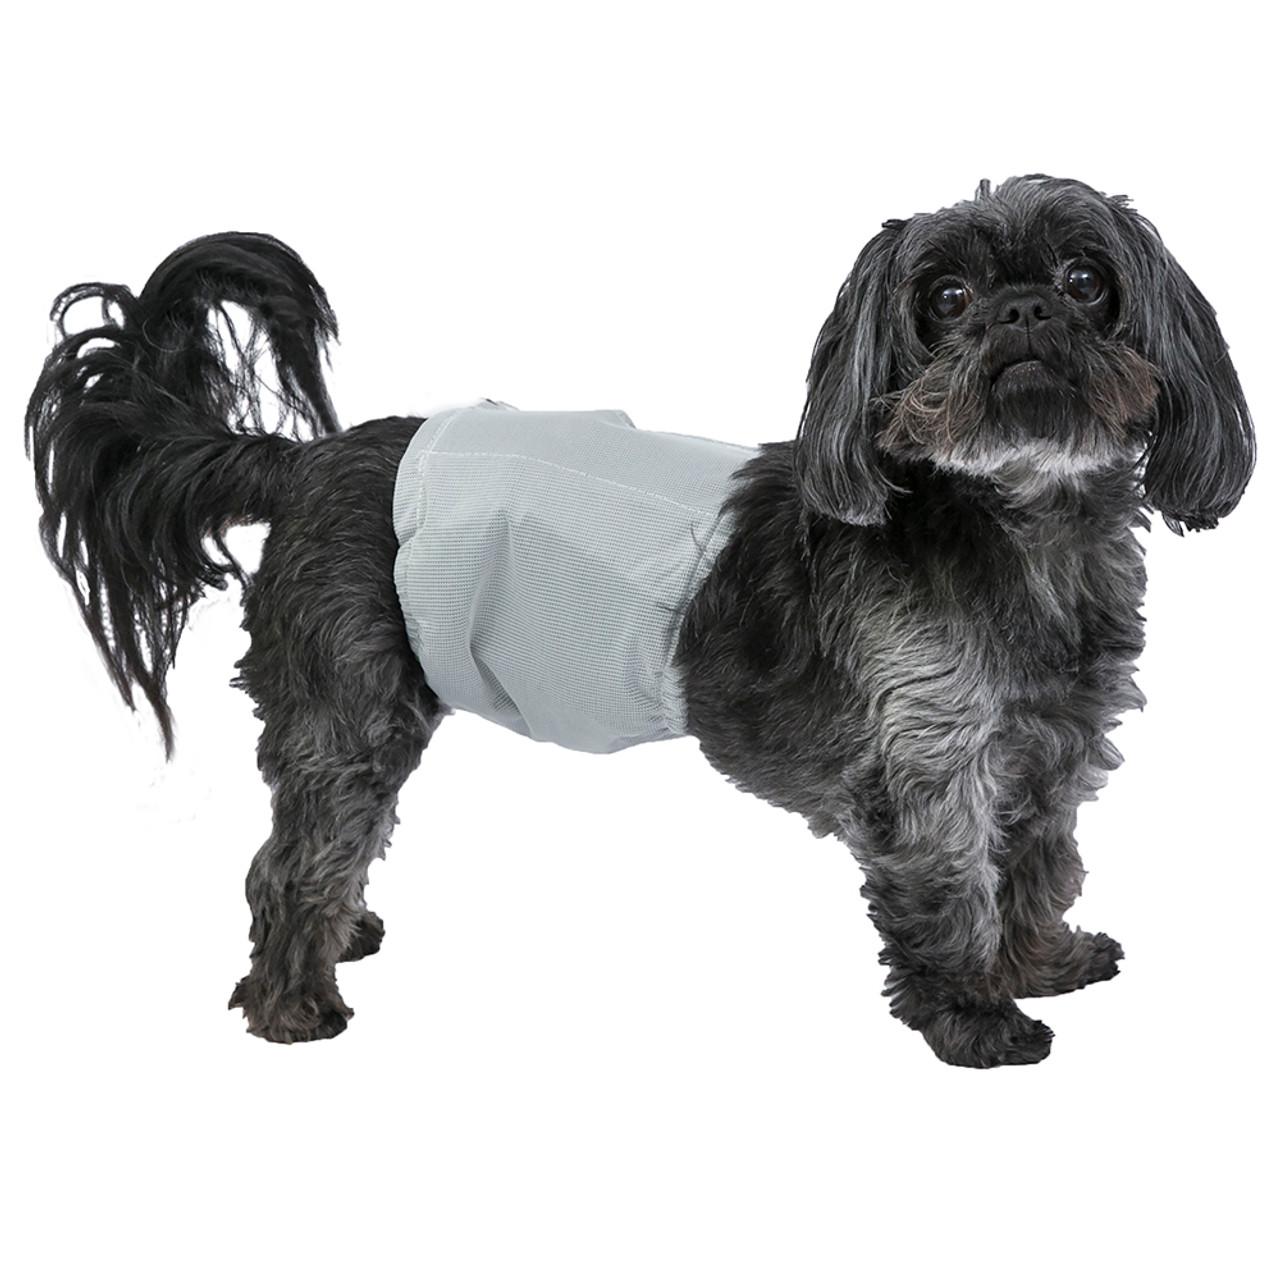 PoochPants Reuseable Male Dog Diaper Wrap